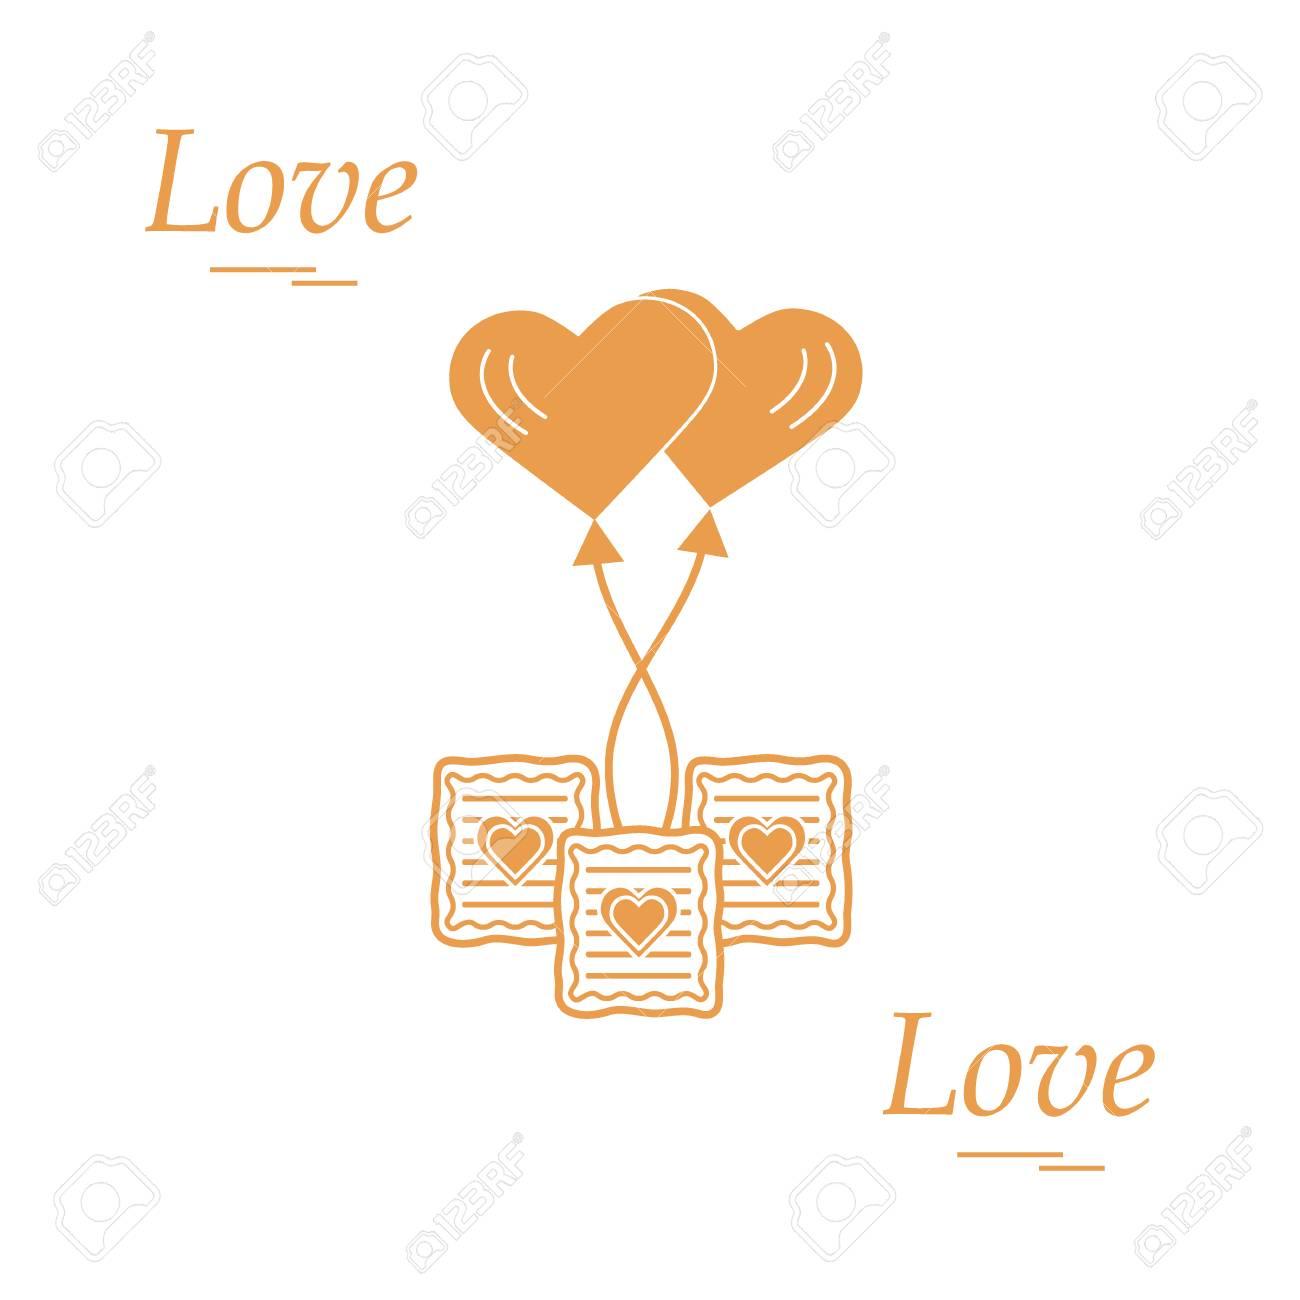 Cute Vector Illustration Of Love Symbols Heart Air Balloon Icon